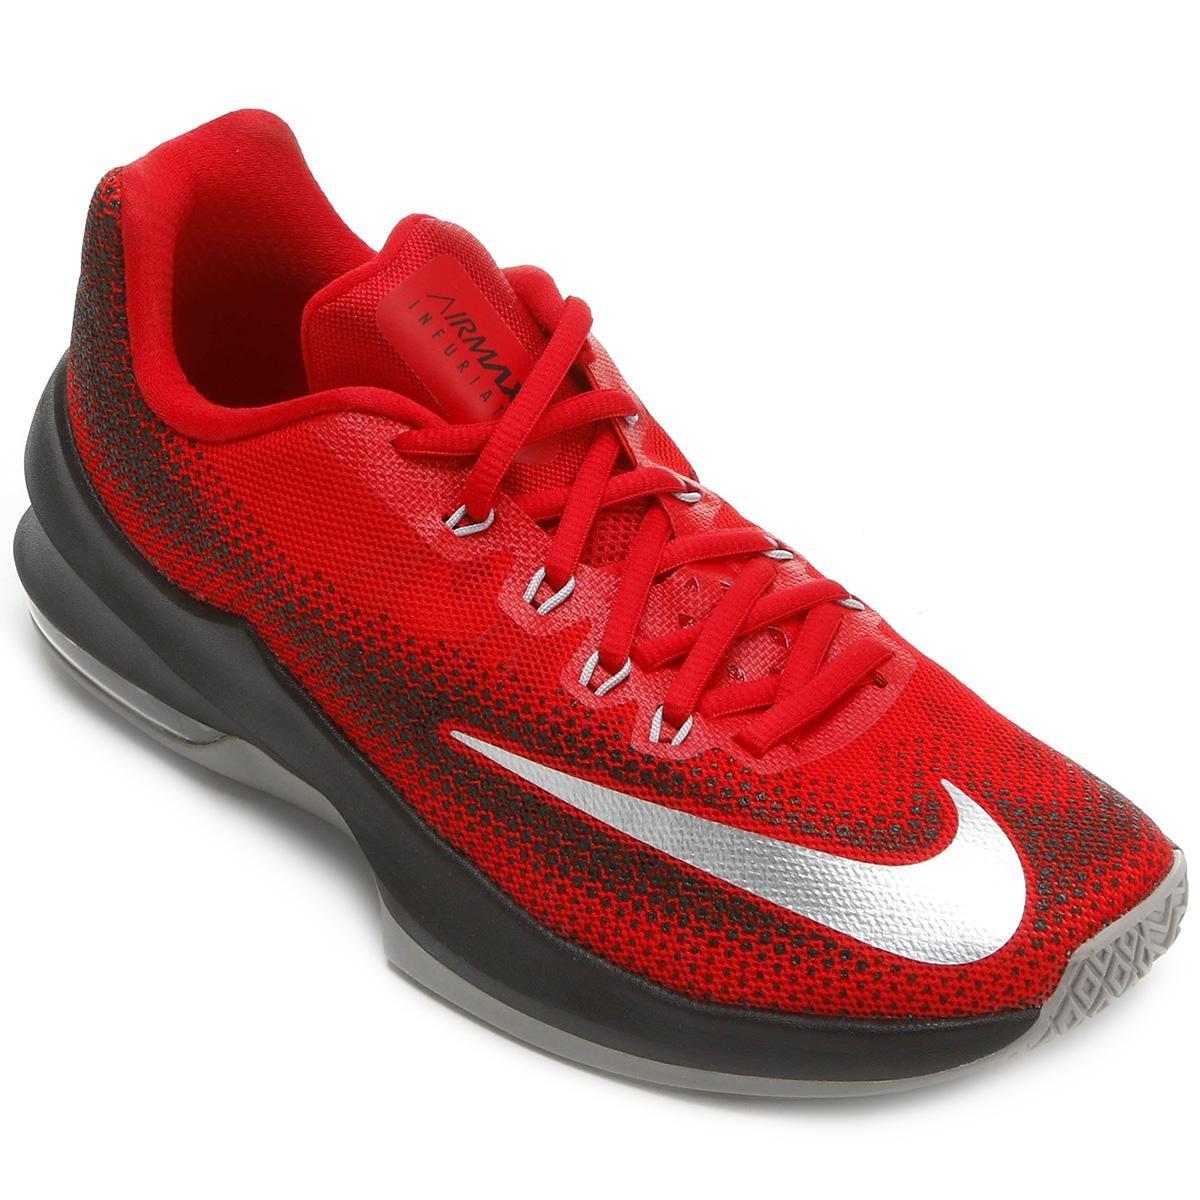 b473183395 Tênis Nike Air Max Infuriate Low Masculino - Vermelho e Preto